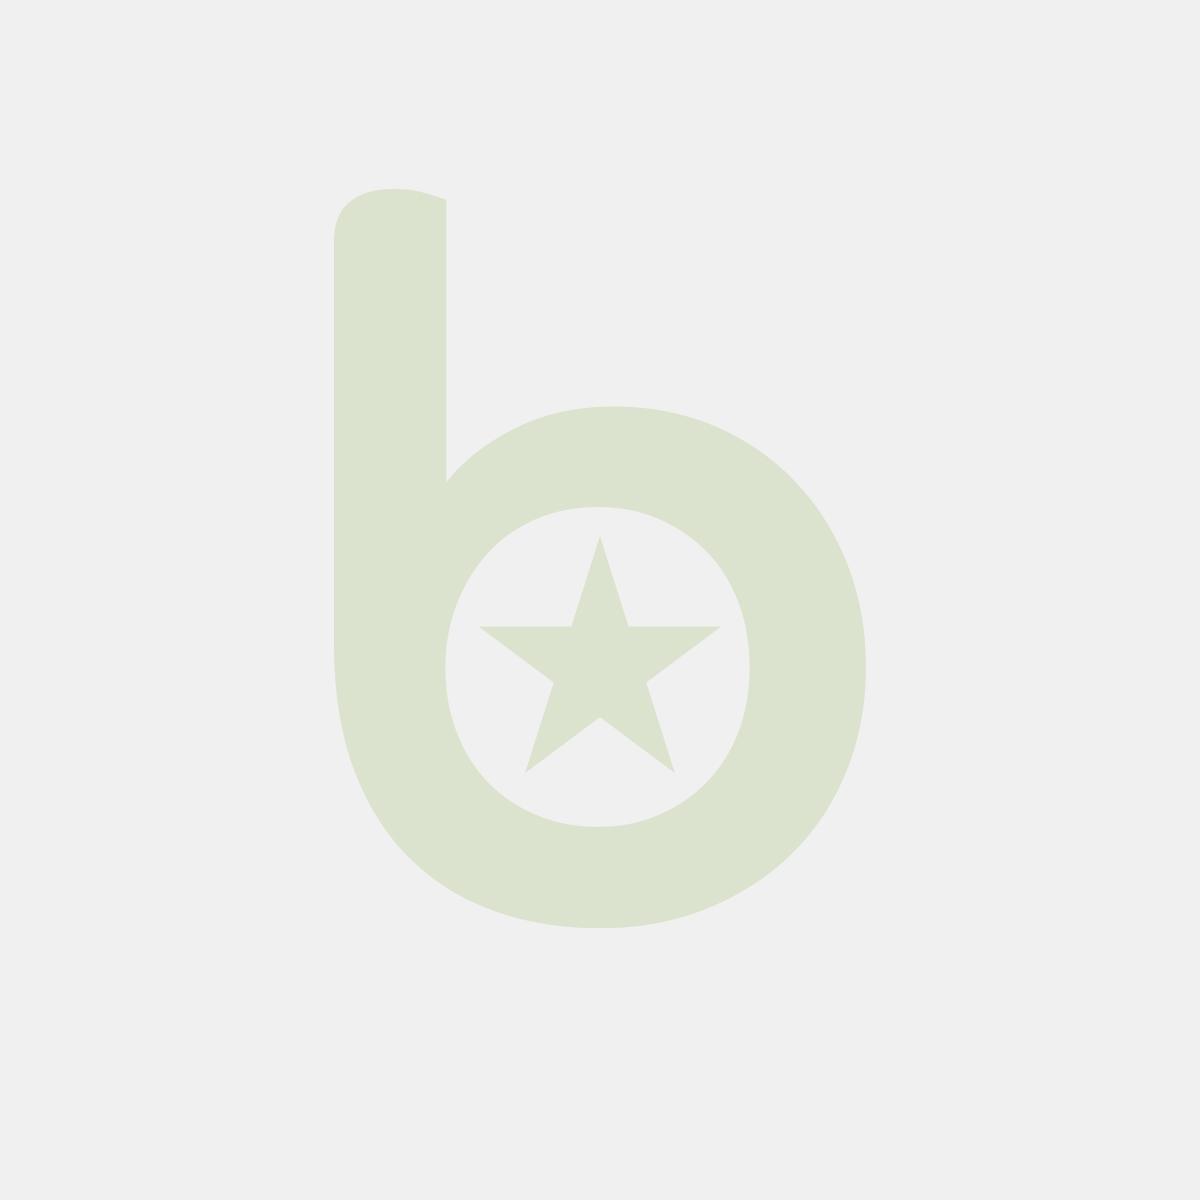 FINGERFOOD - pucharki okrągłe śr.4,5xh.4,5cm drewniane op. 50 sztuk